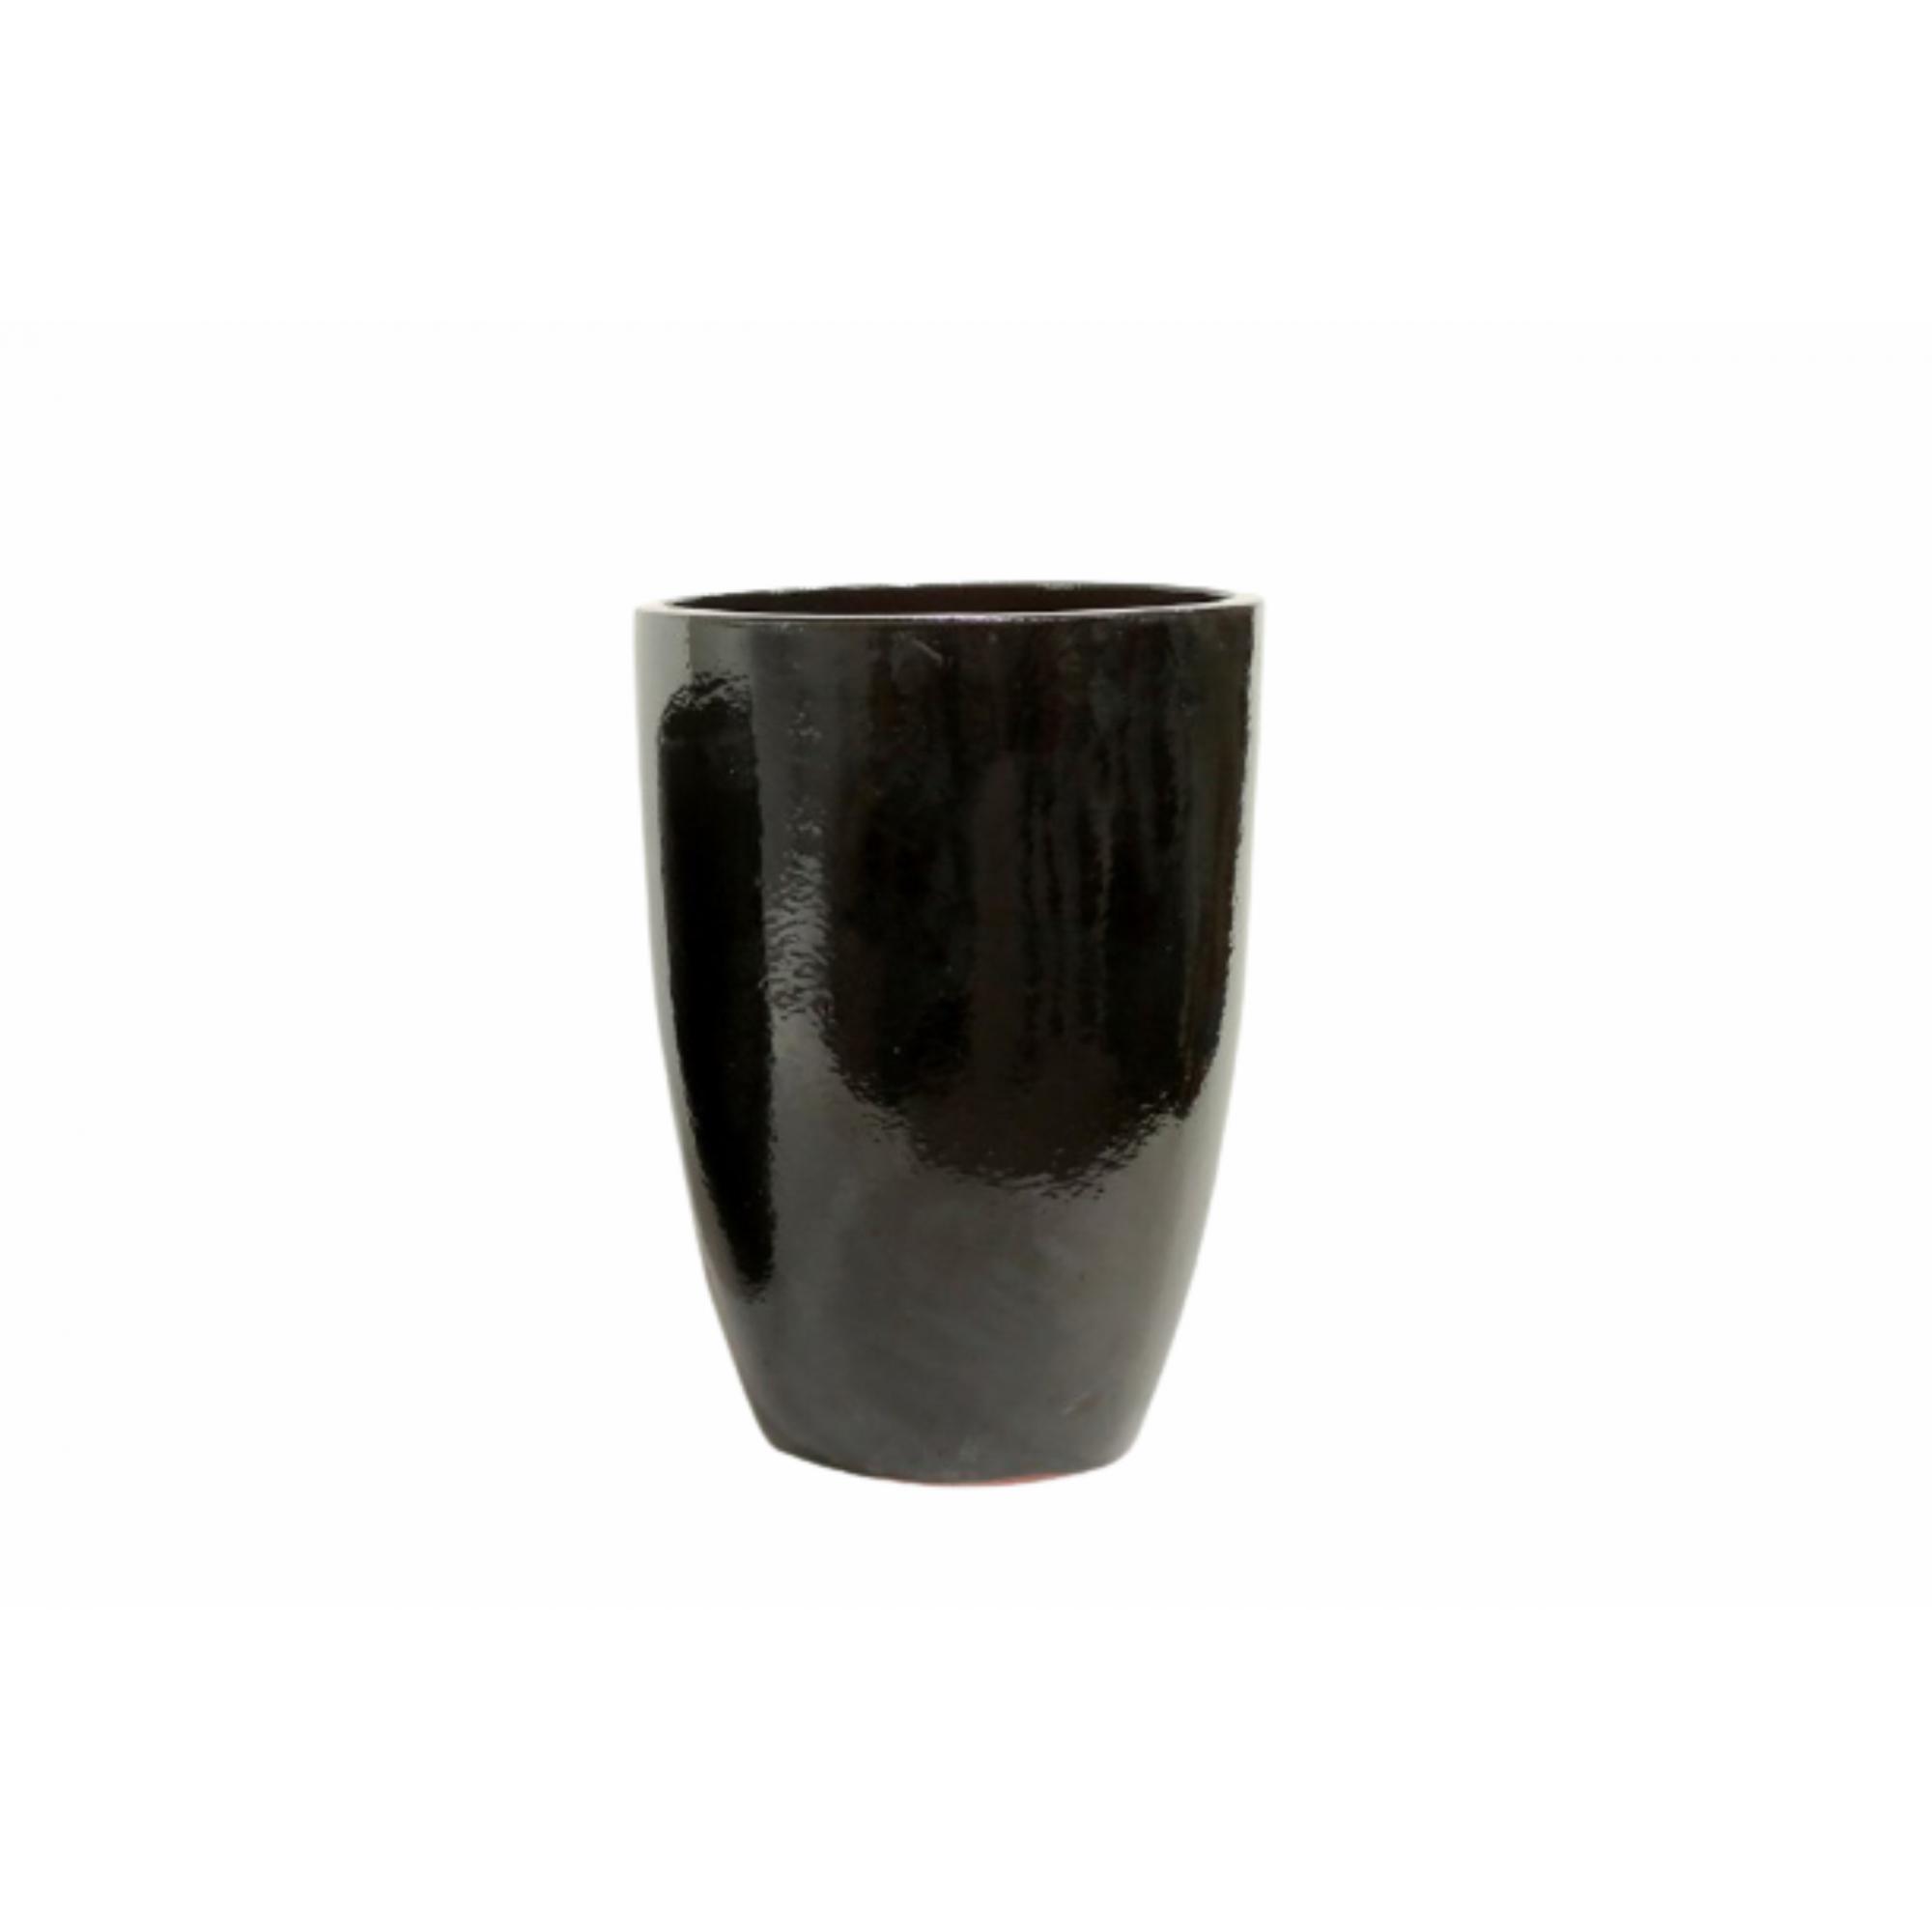 Vaso de Cerâmica Artesanal Preto Liv 43x62cm